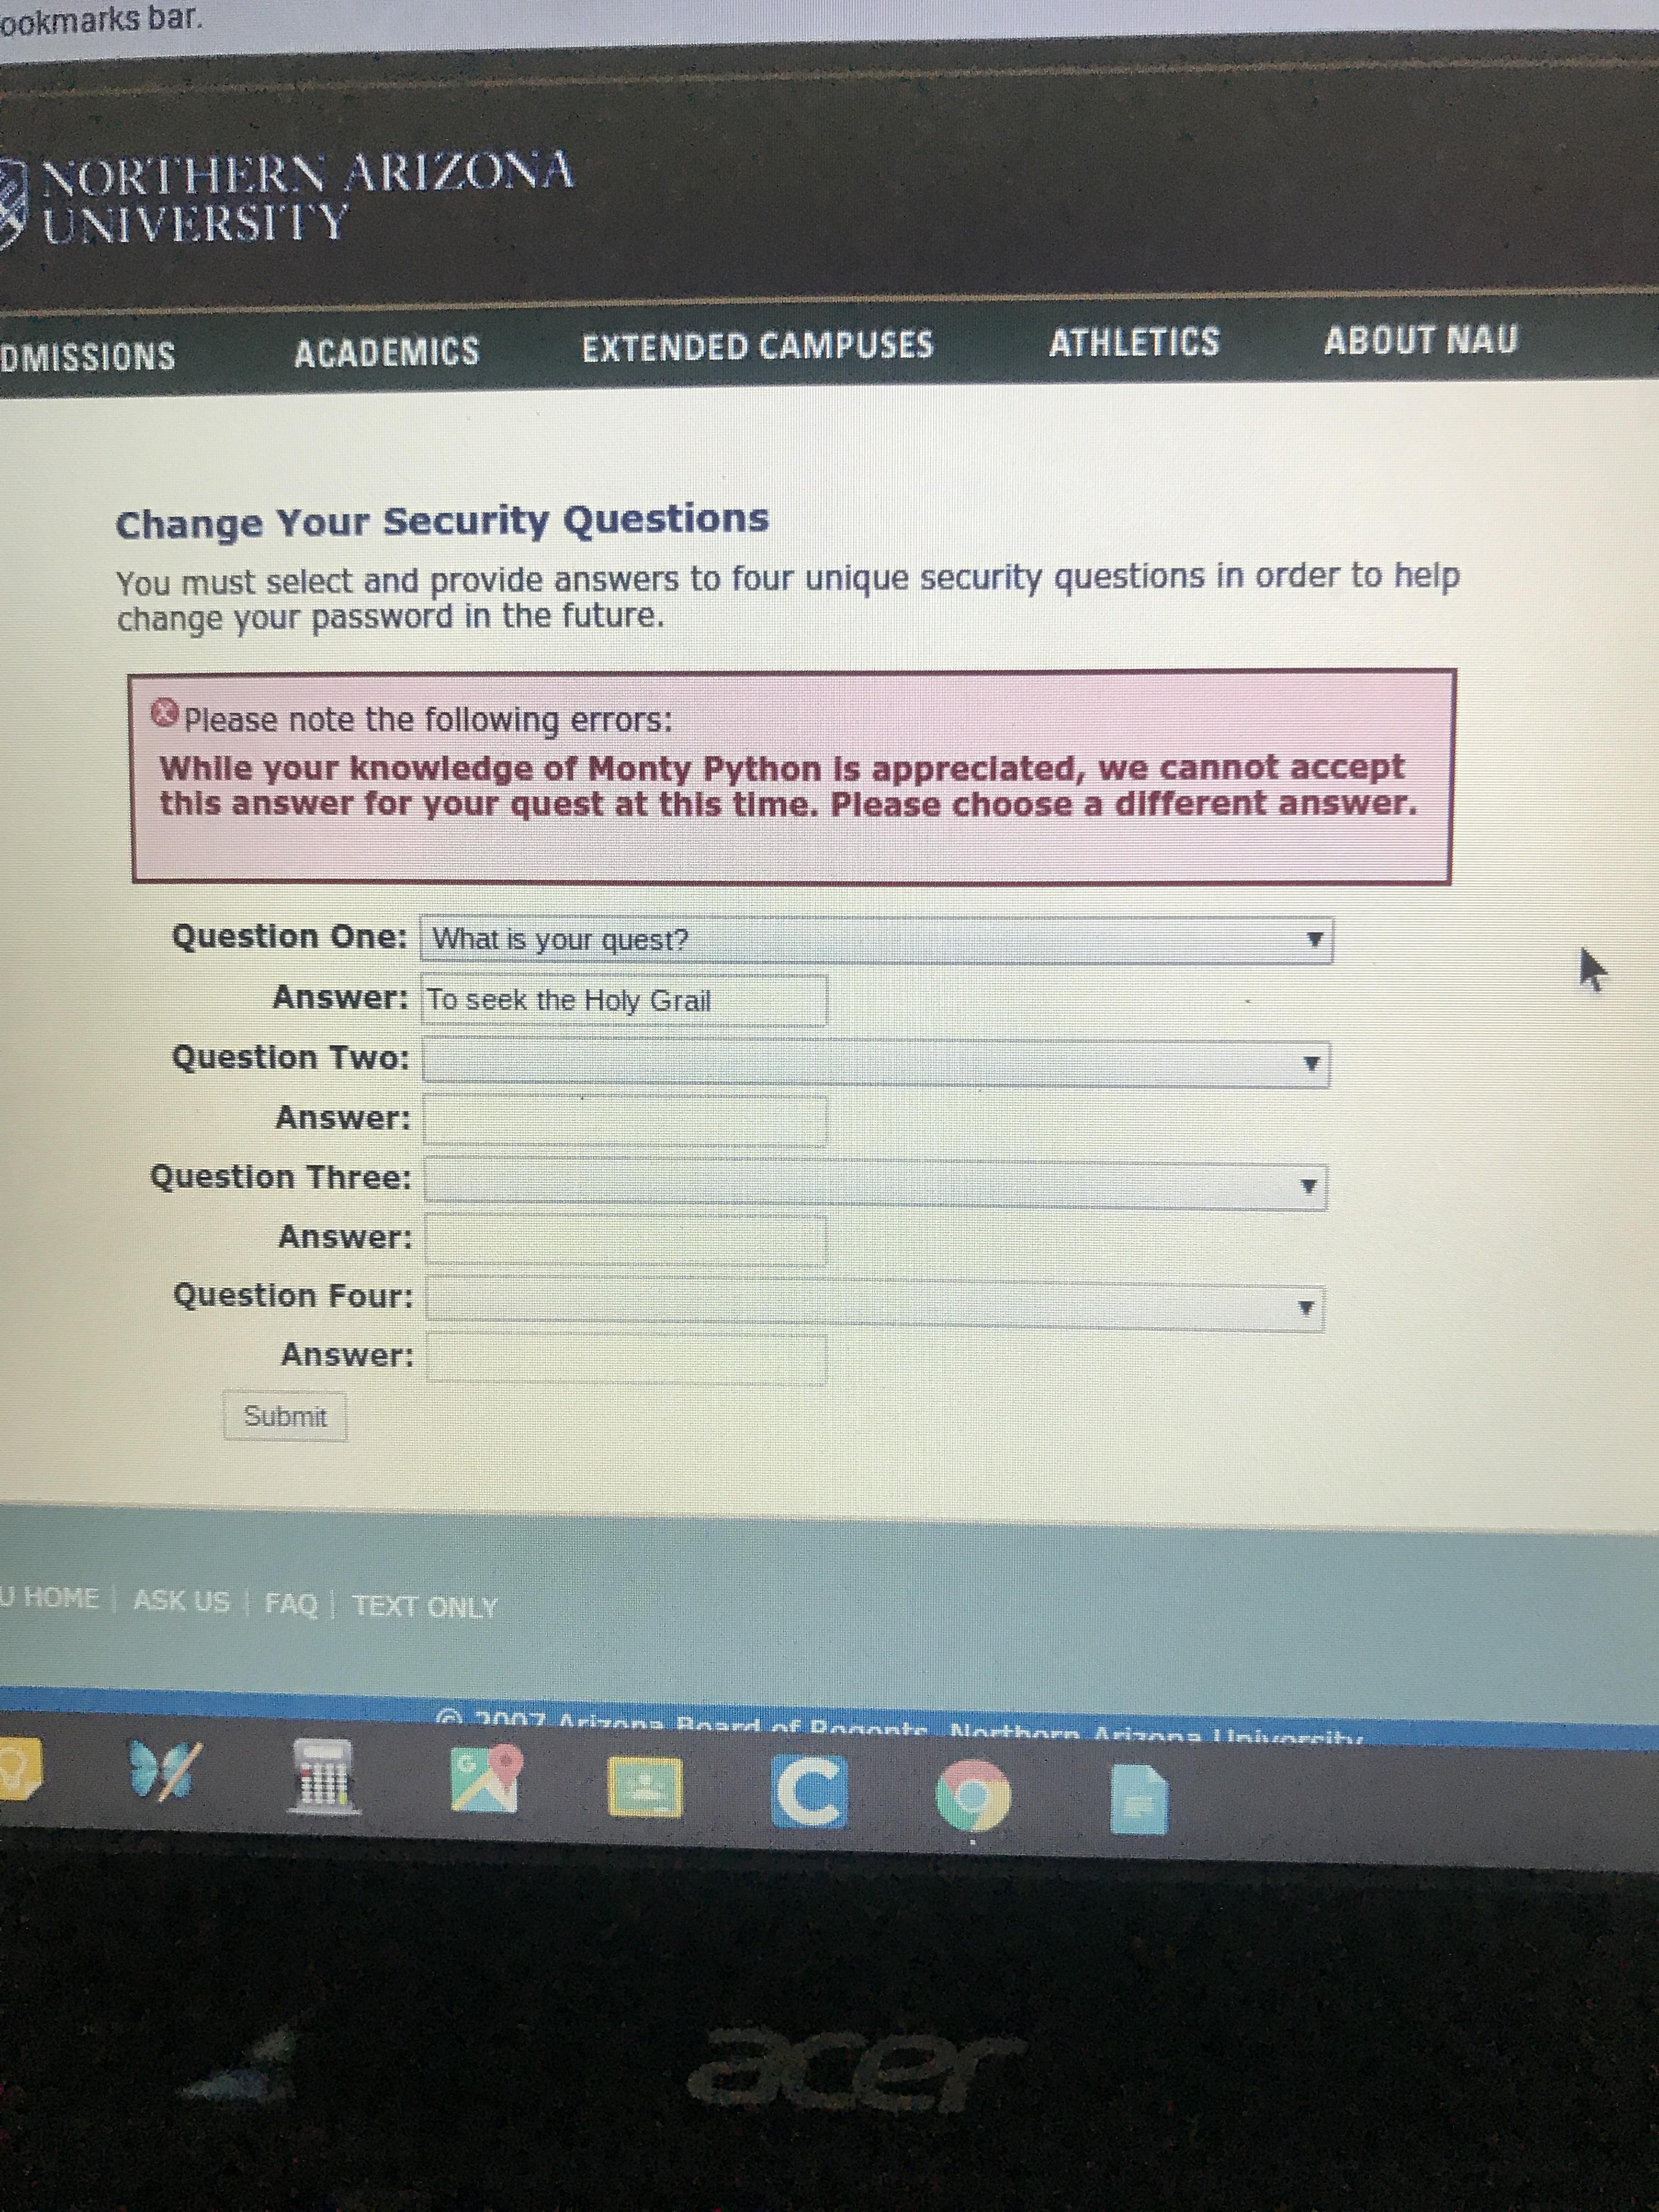 University of Northern Arizona has a pretty great error message